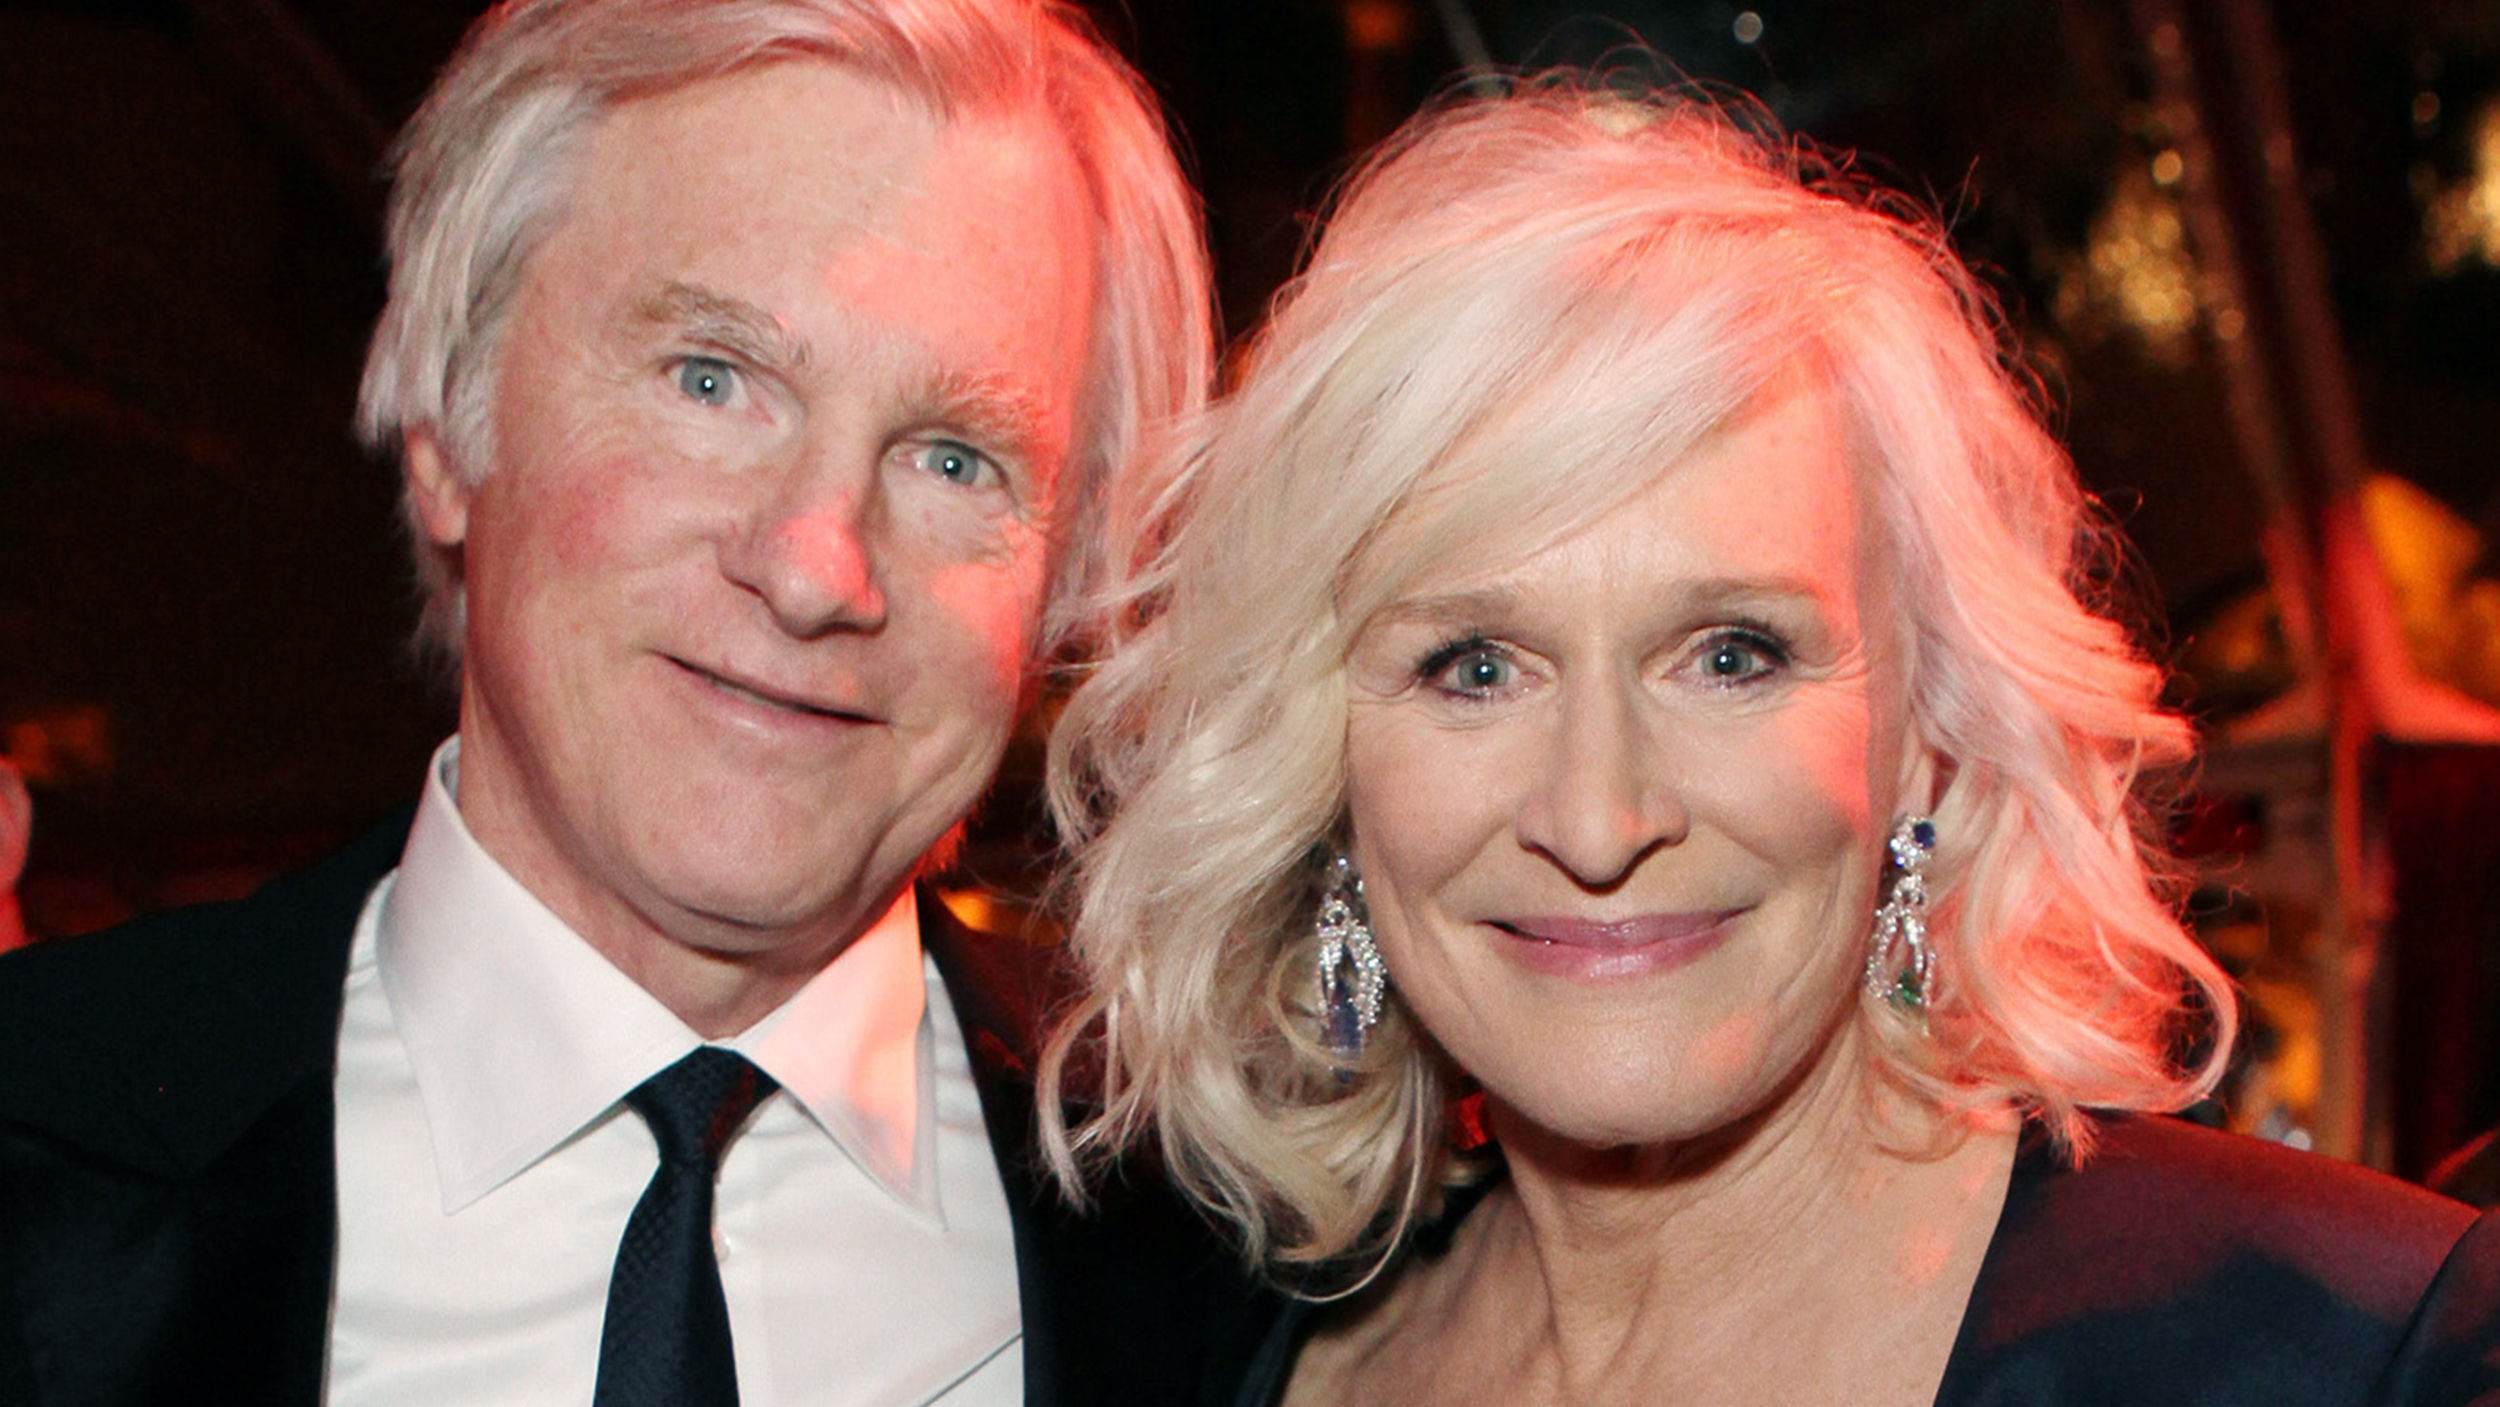 glenn close divorces third husband david shaw after nine